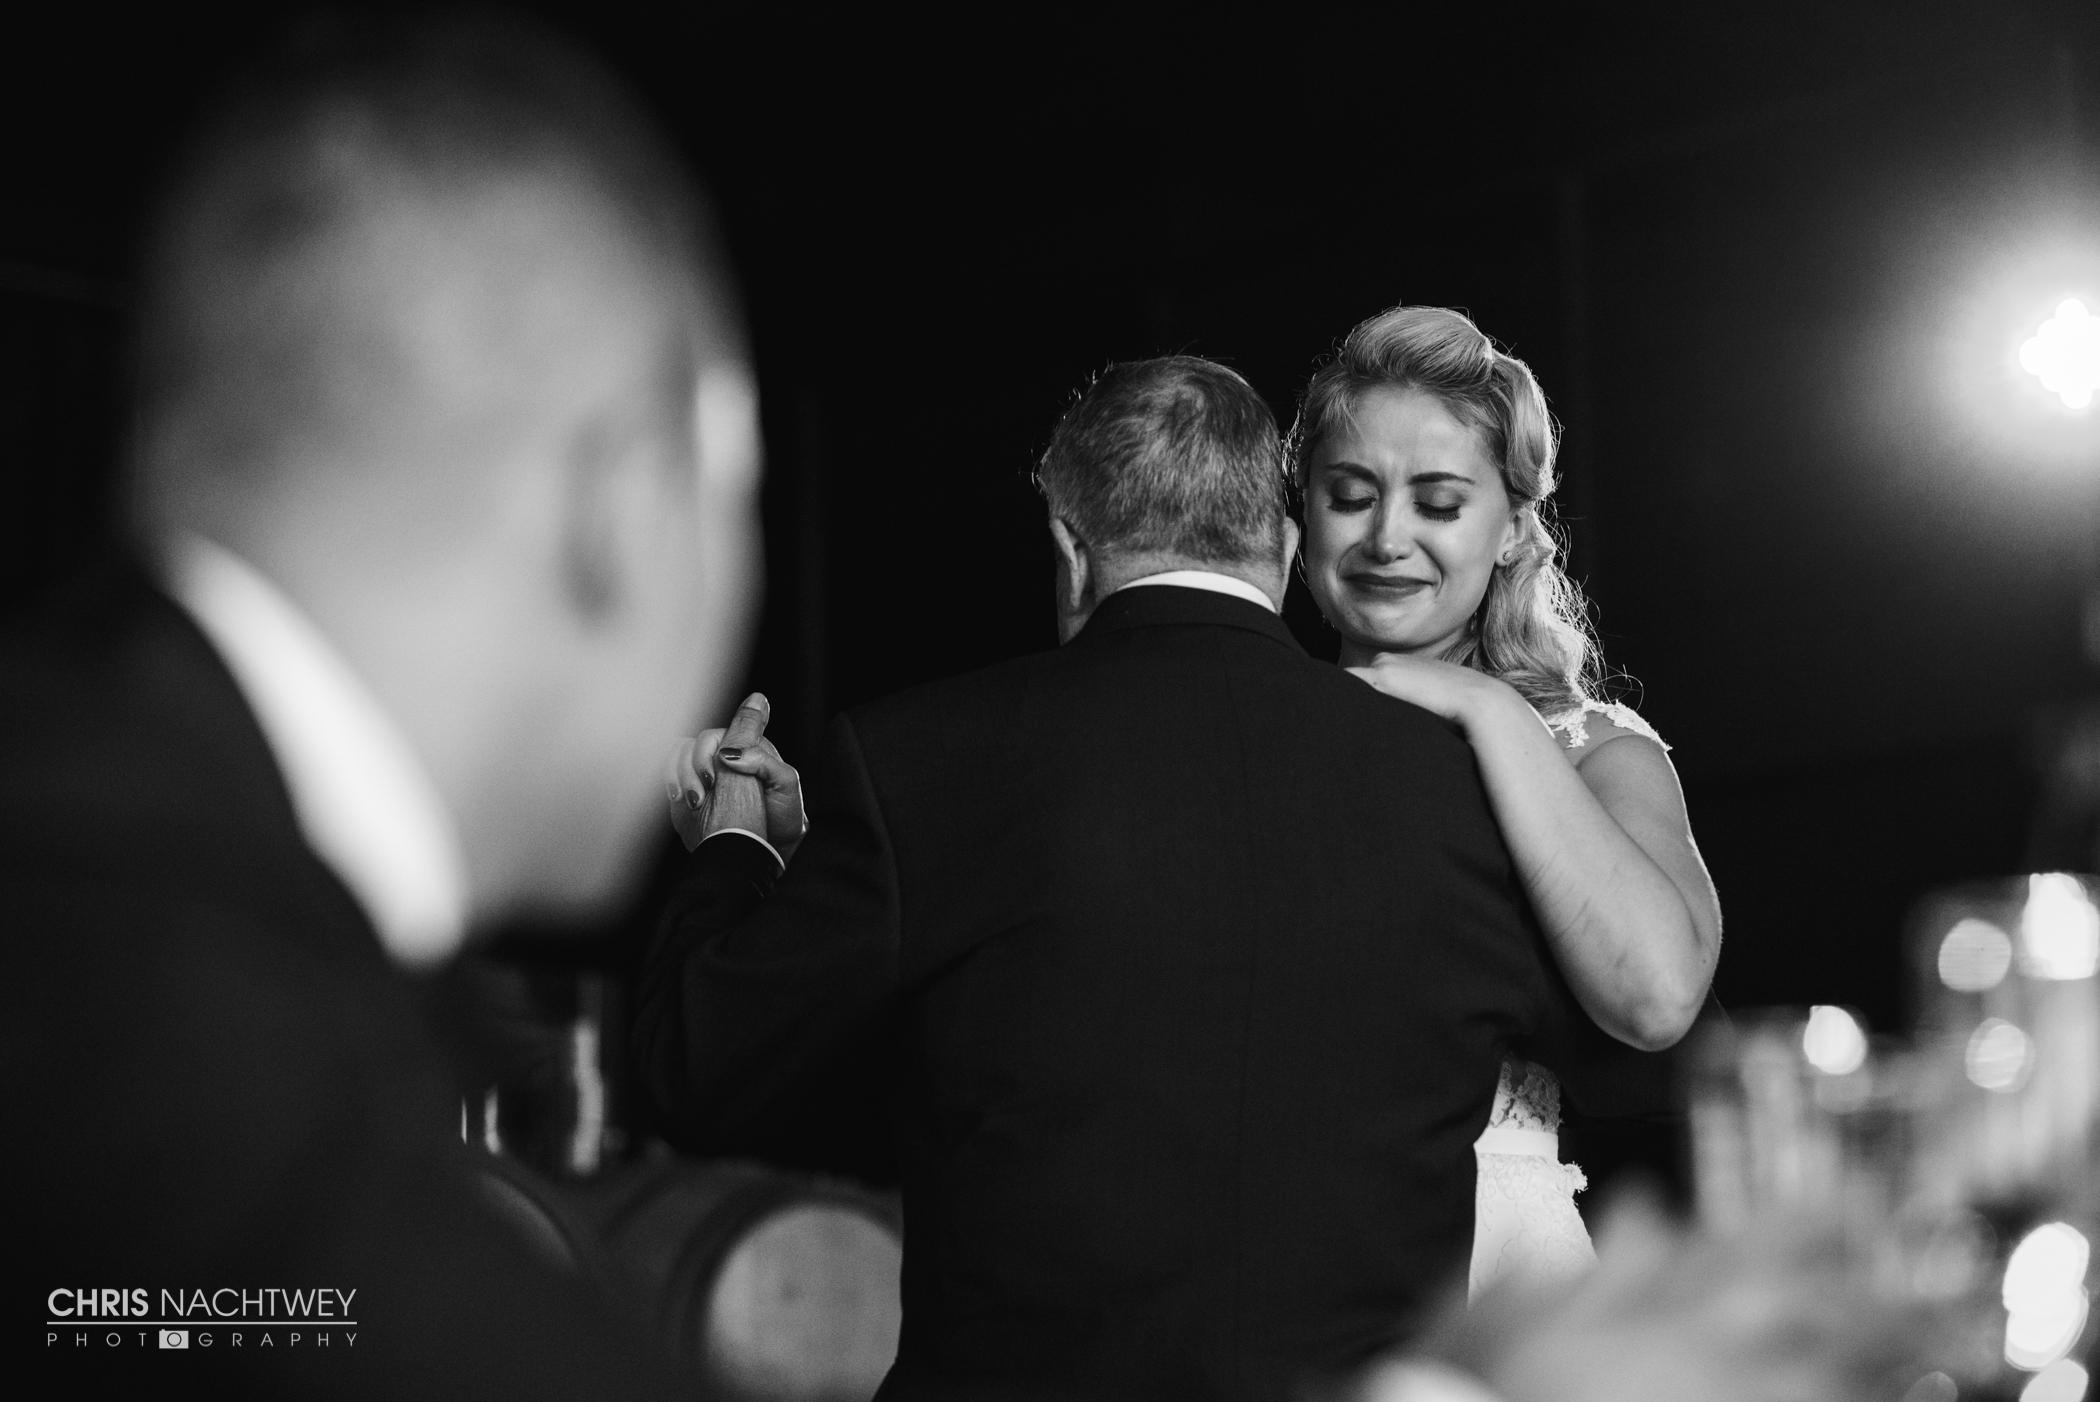 wedding-saltwater-farm-vineyard-photos-stonington-ct-chris-nachtwey-photography-2016-ana-austin-39.jpg